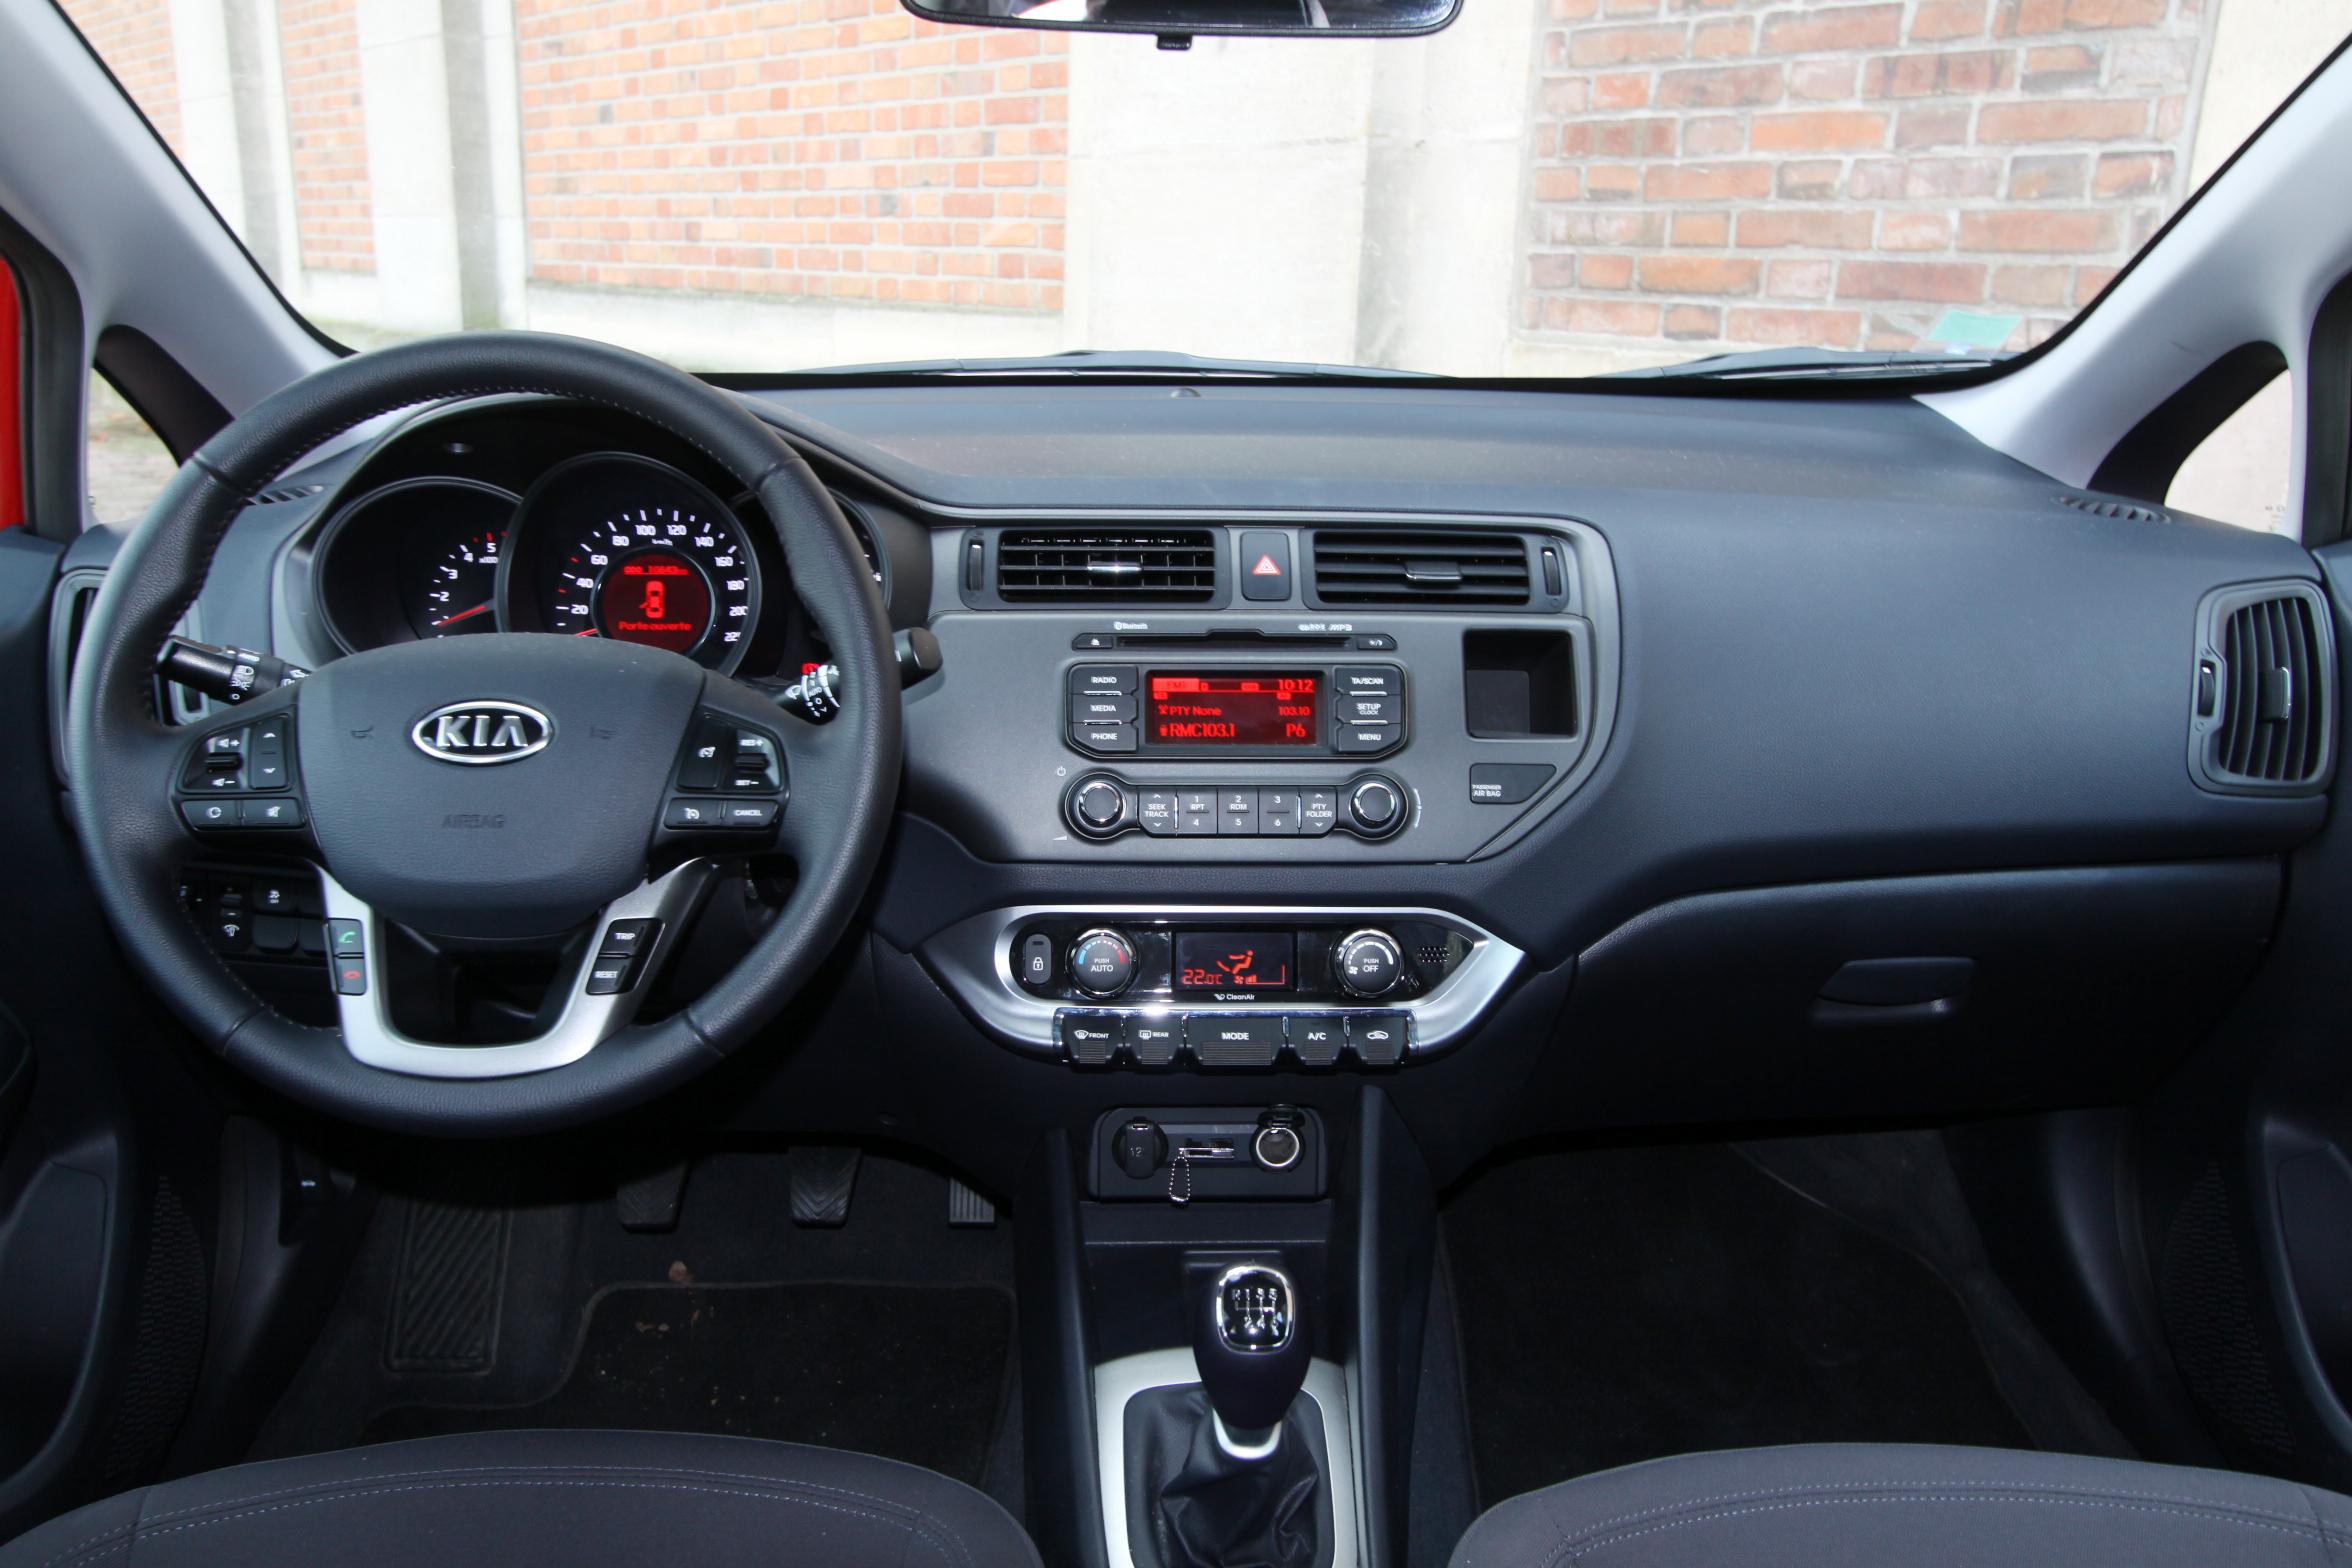 Toyota yaris vs kia rio les d complex es for Interieur yaris 3